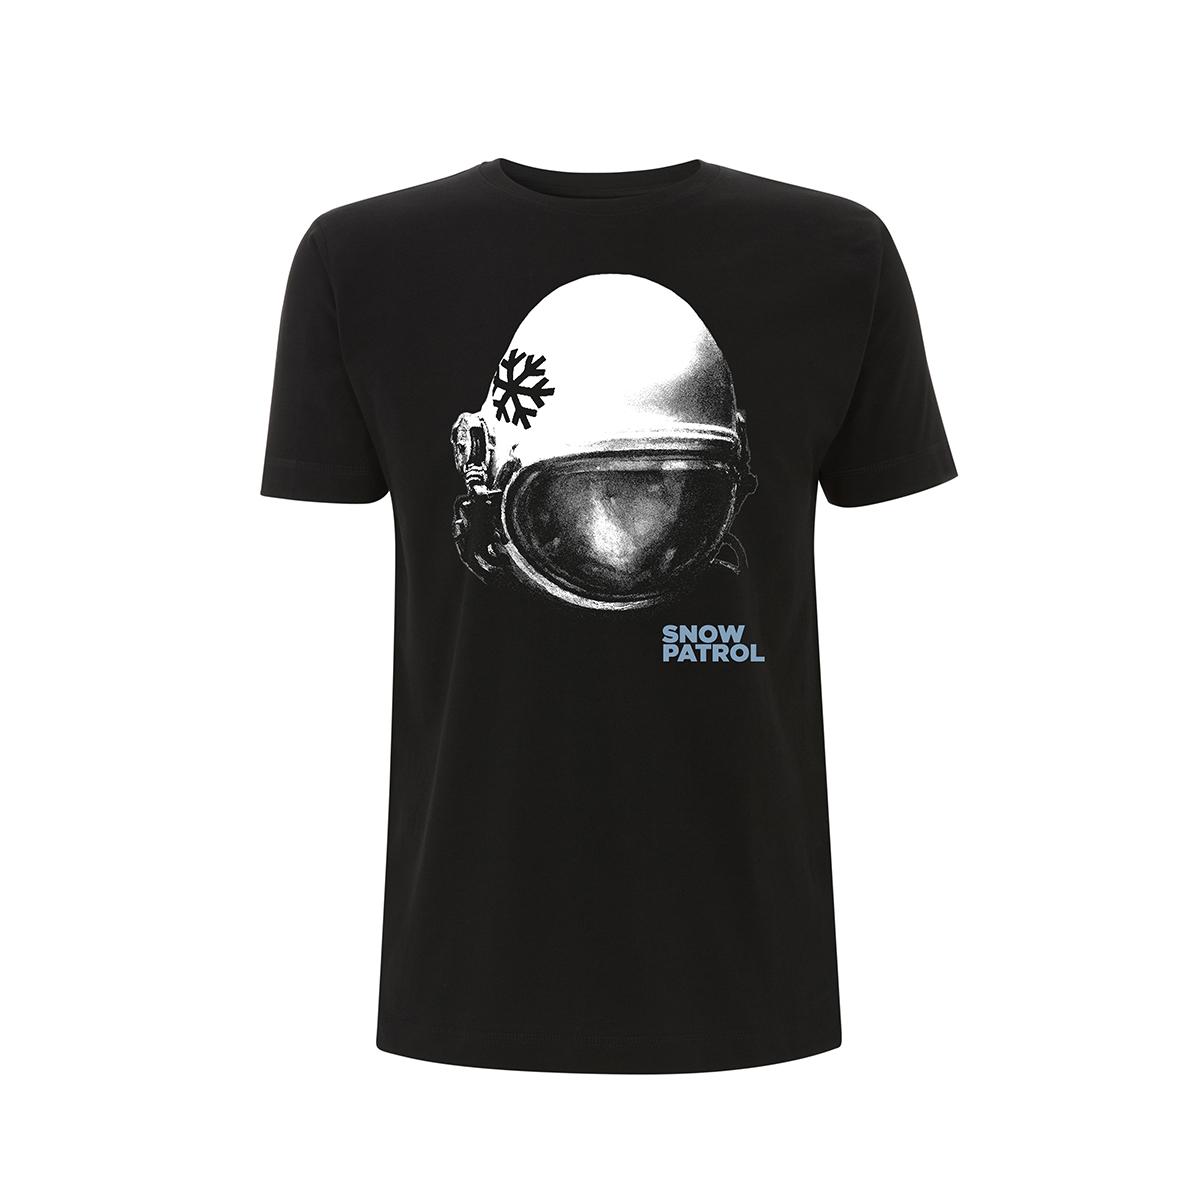 Astronaut Helmet - UK/Europe Dateback Black Tee - Snow Patrol